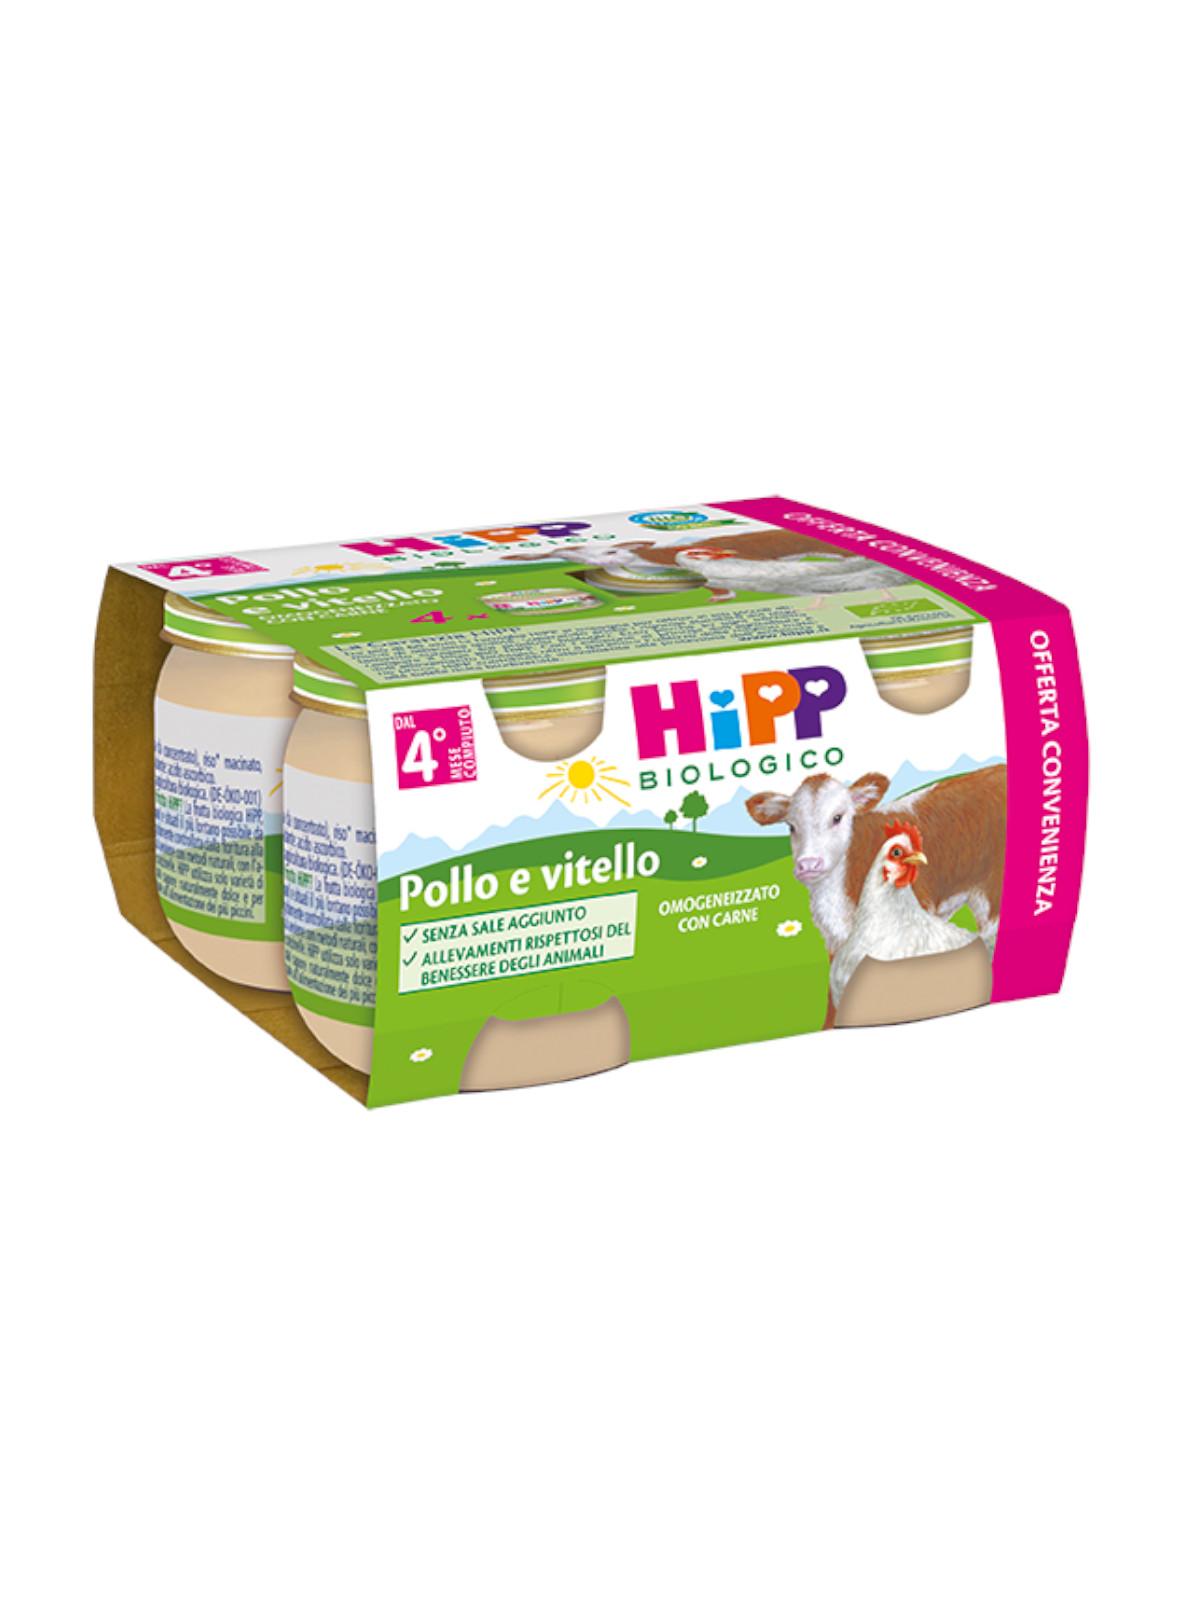 Omogeneizzato pollo e vitello 4x80g - Hipp